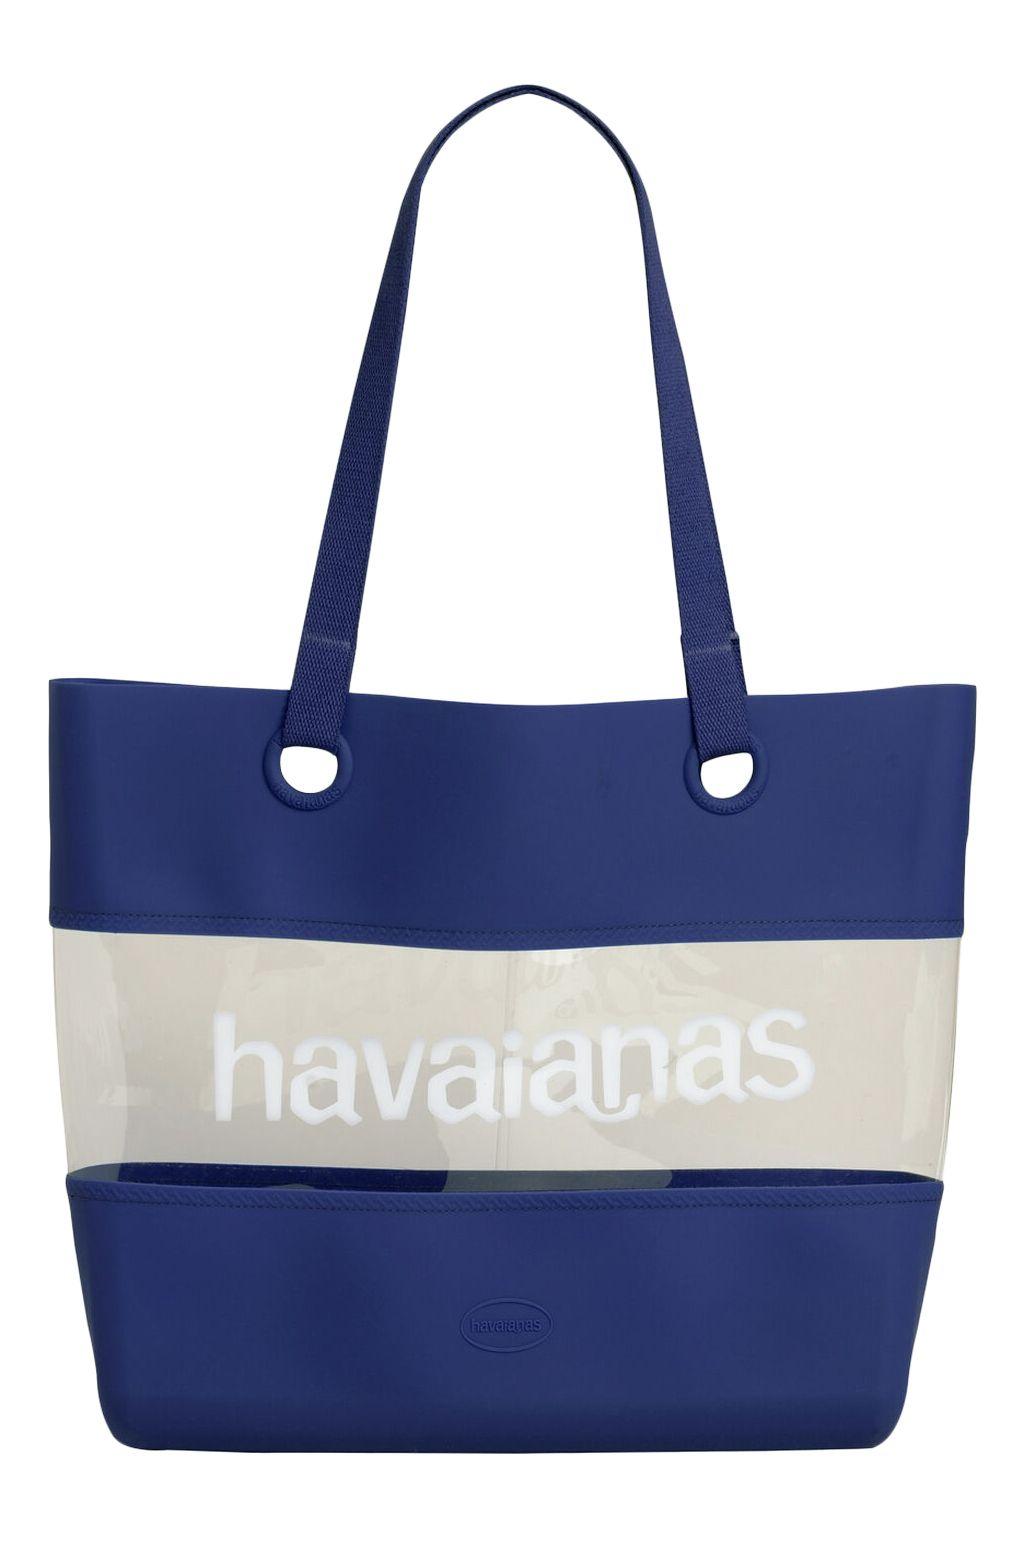 Havaianas Bag  BEACH BAG Navy Blue